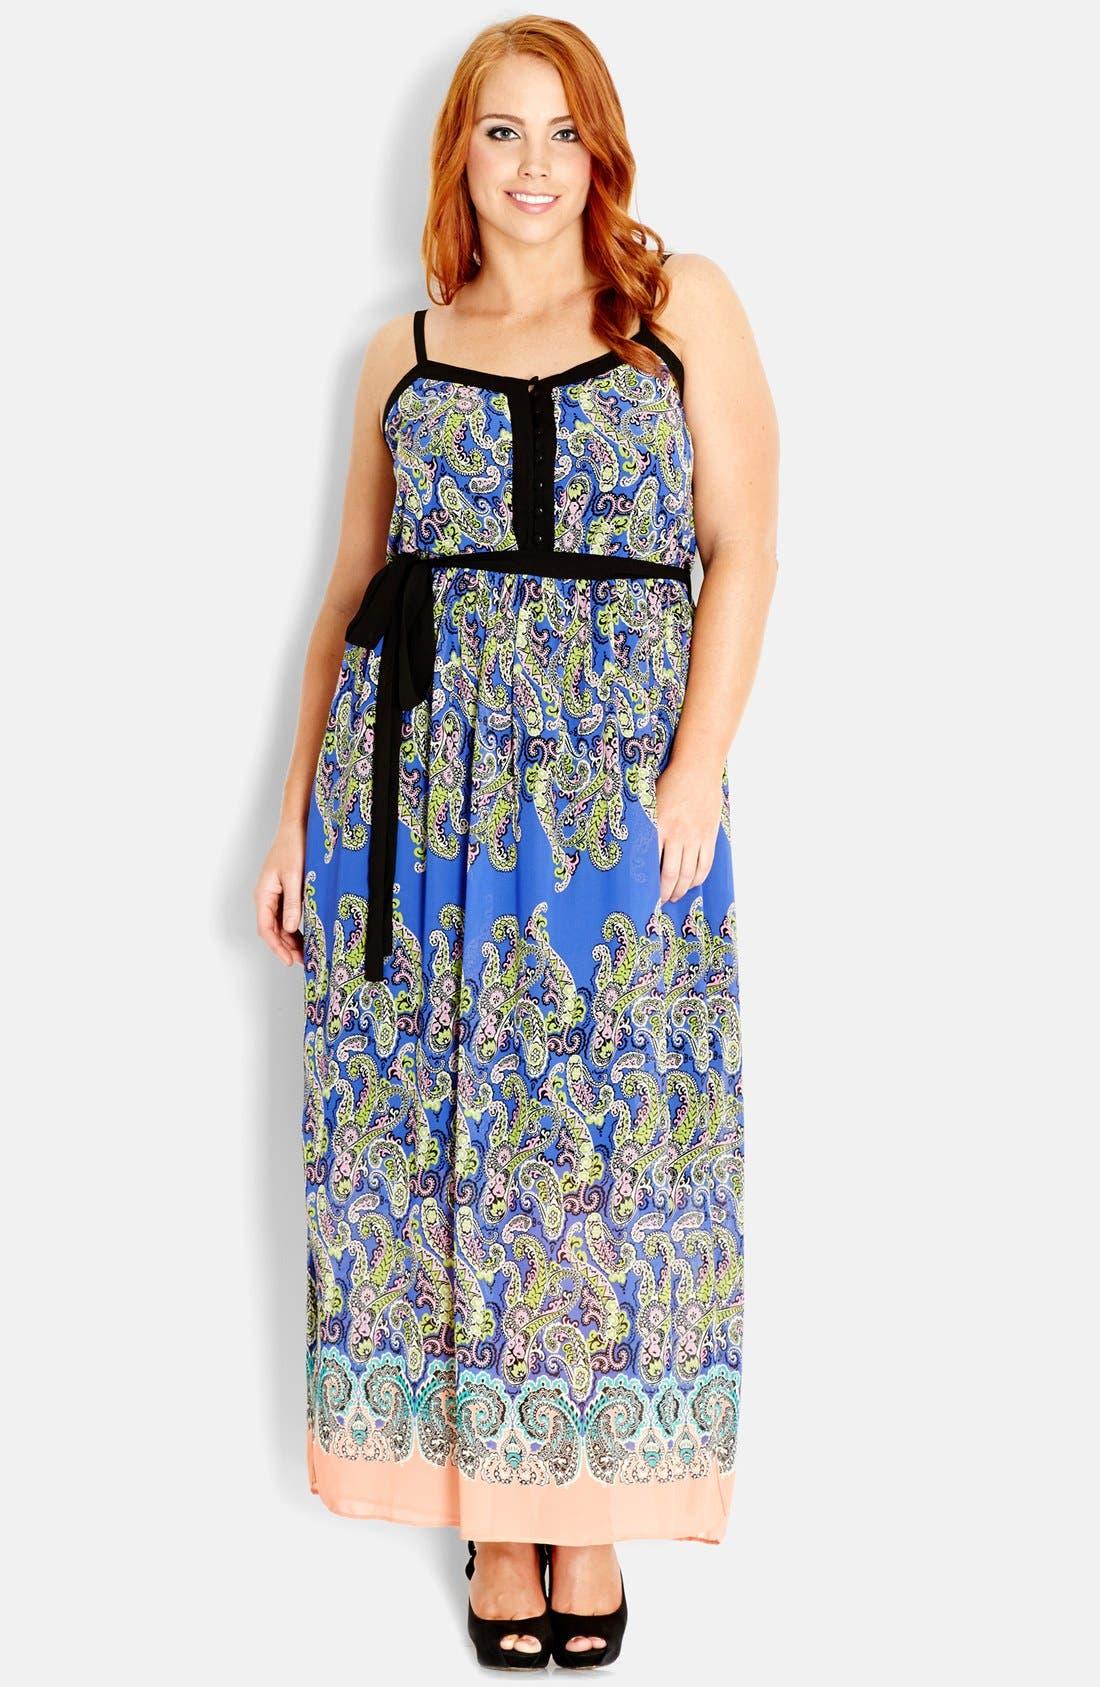 Alternate Image 1 Selected - City Chic 'Paisley Blues' Maxi Dress (Plus Size)